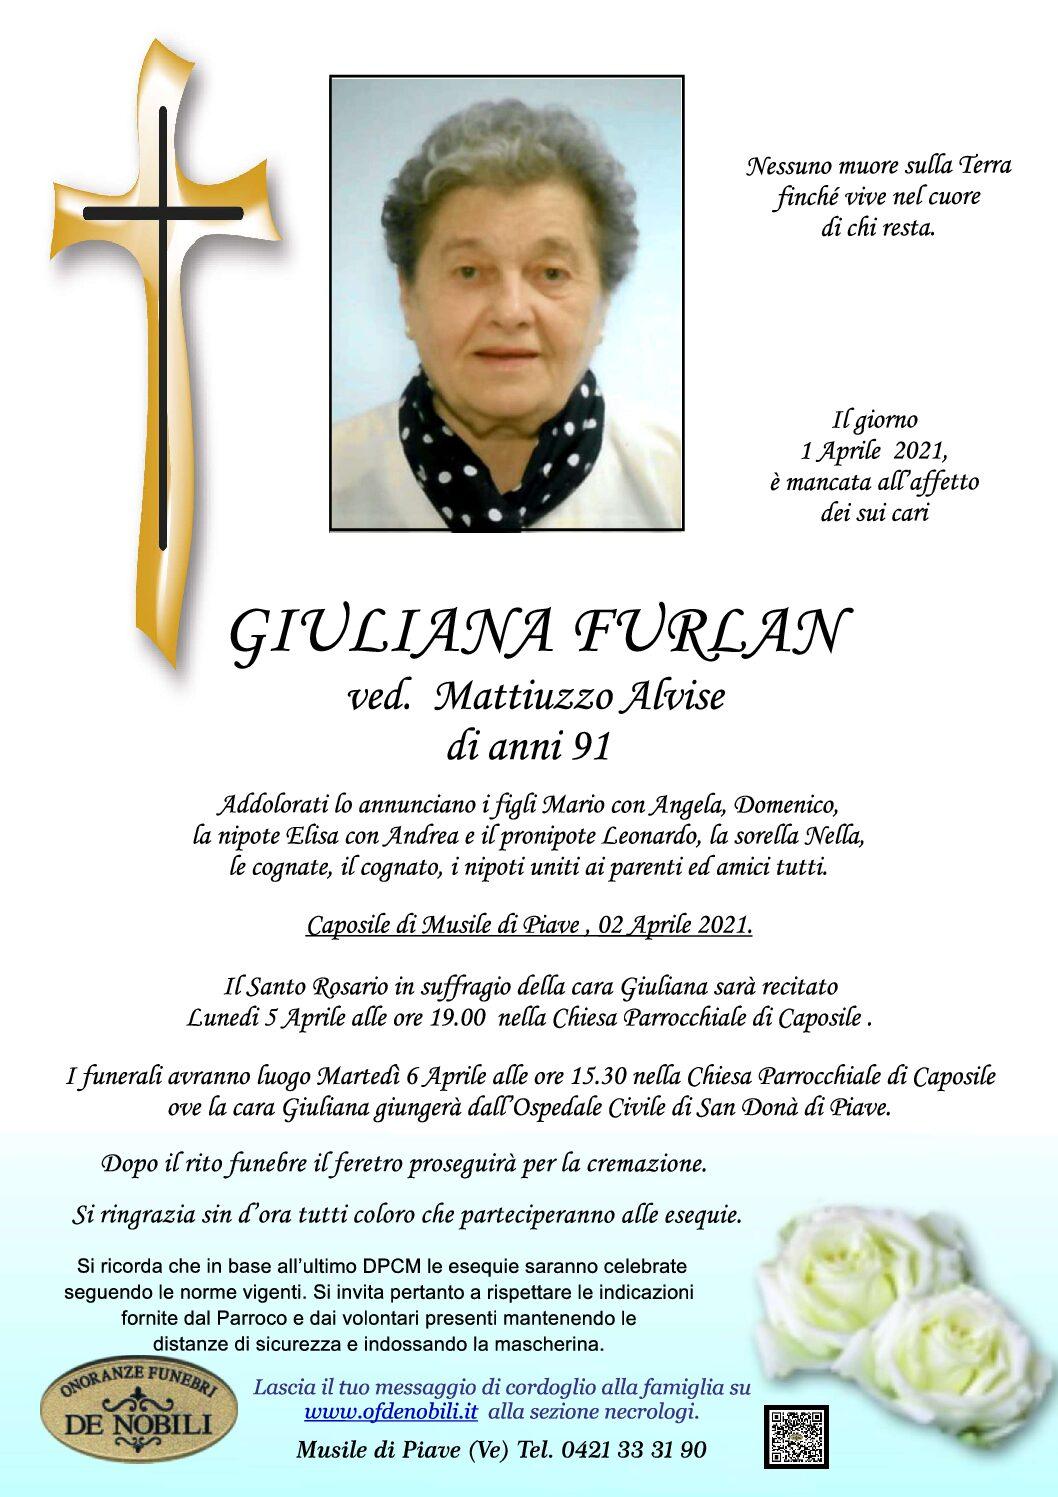 Giuliana Furlan